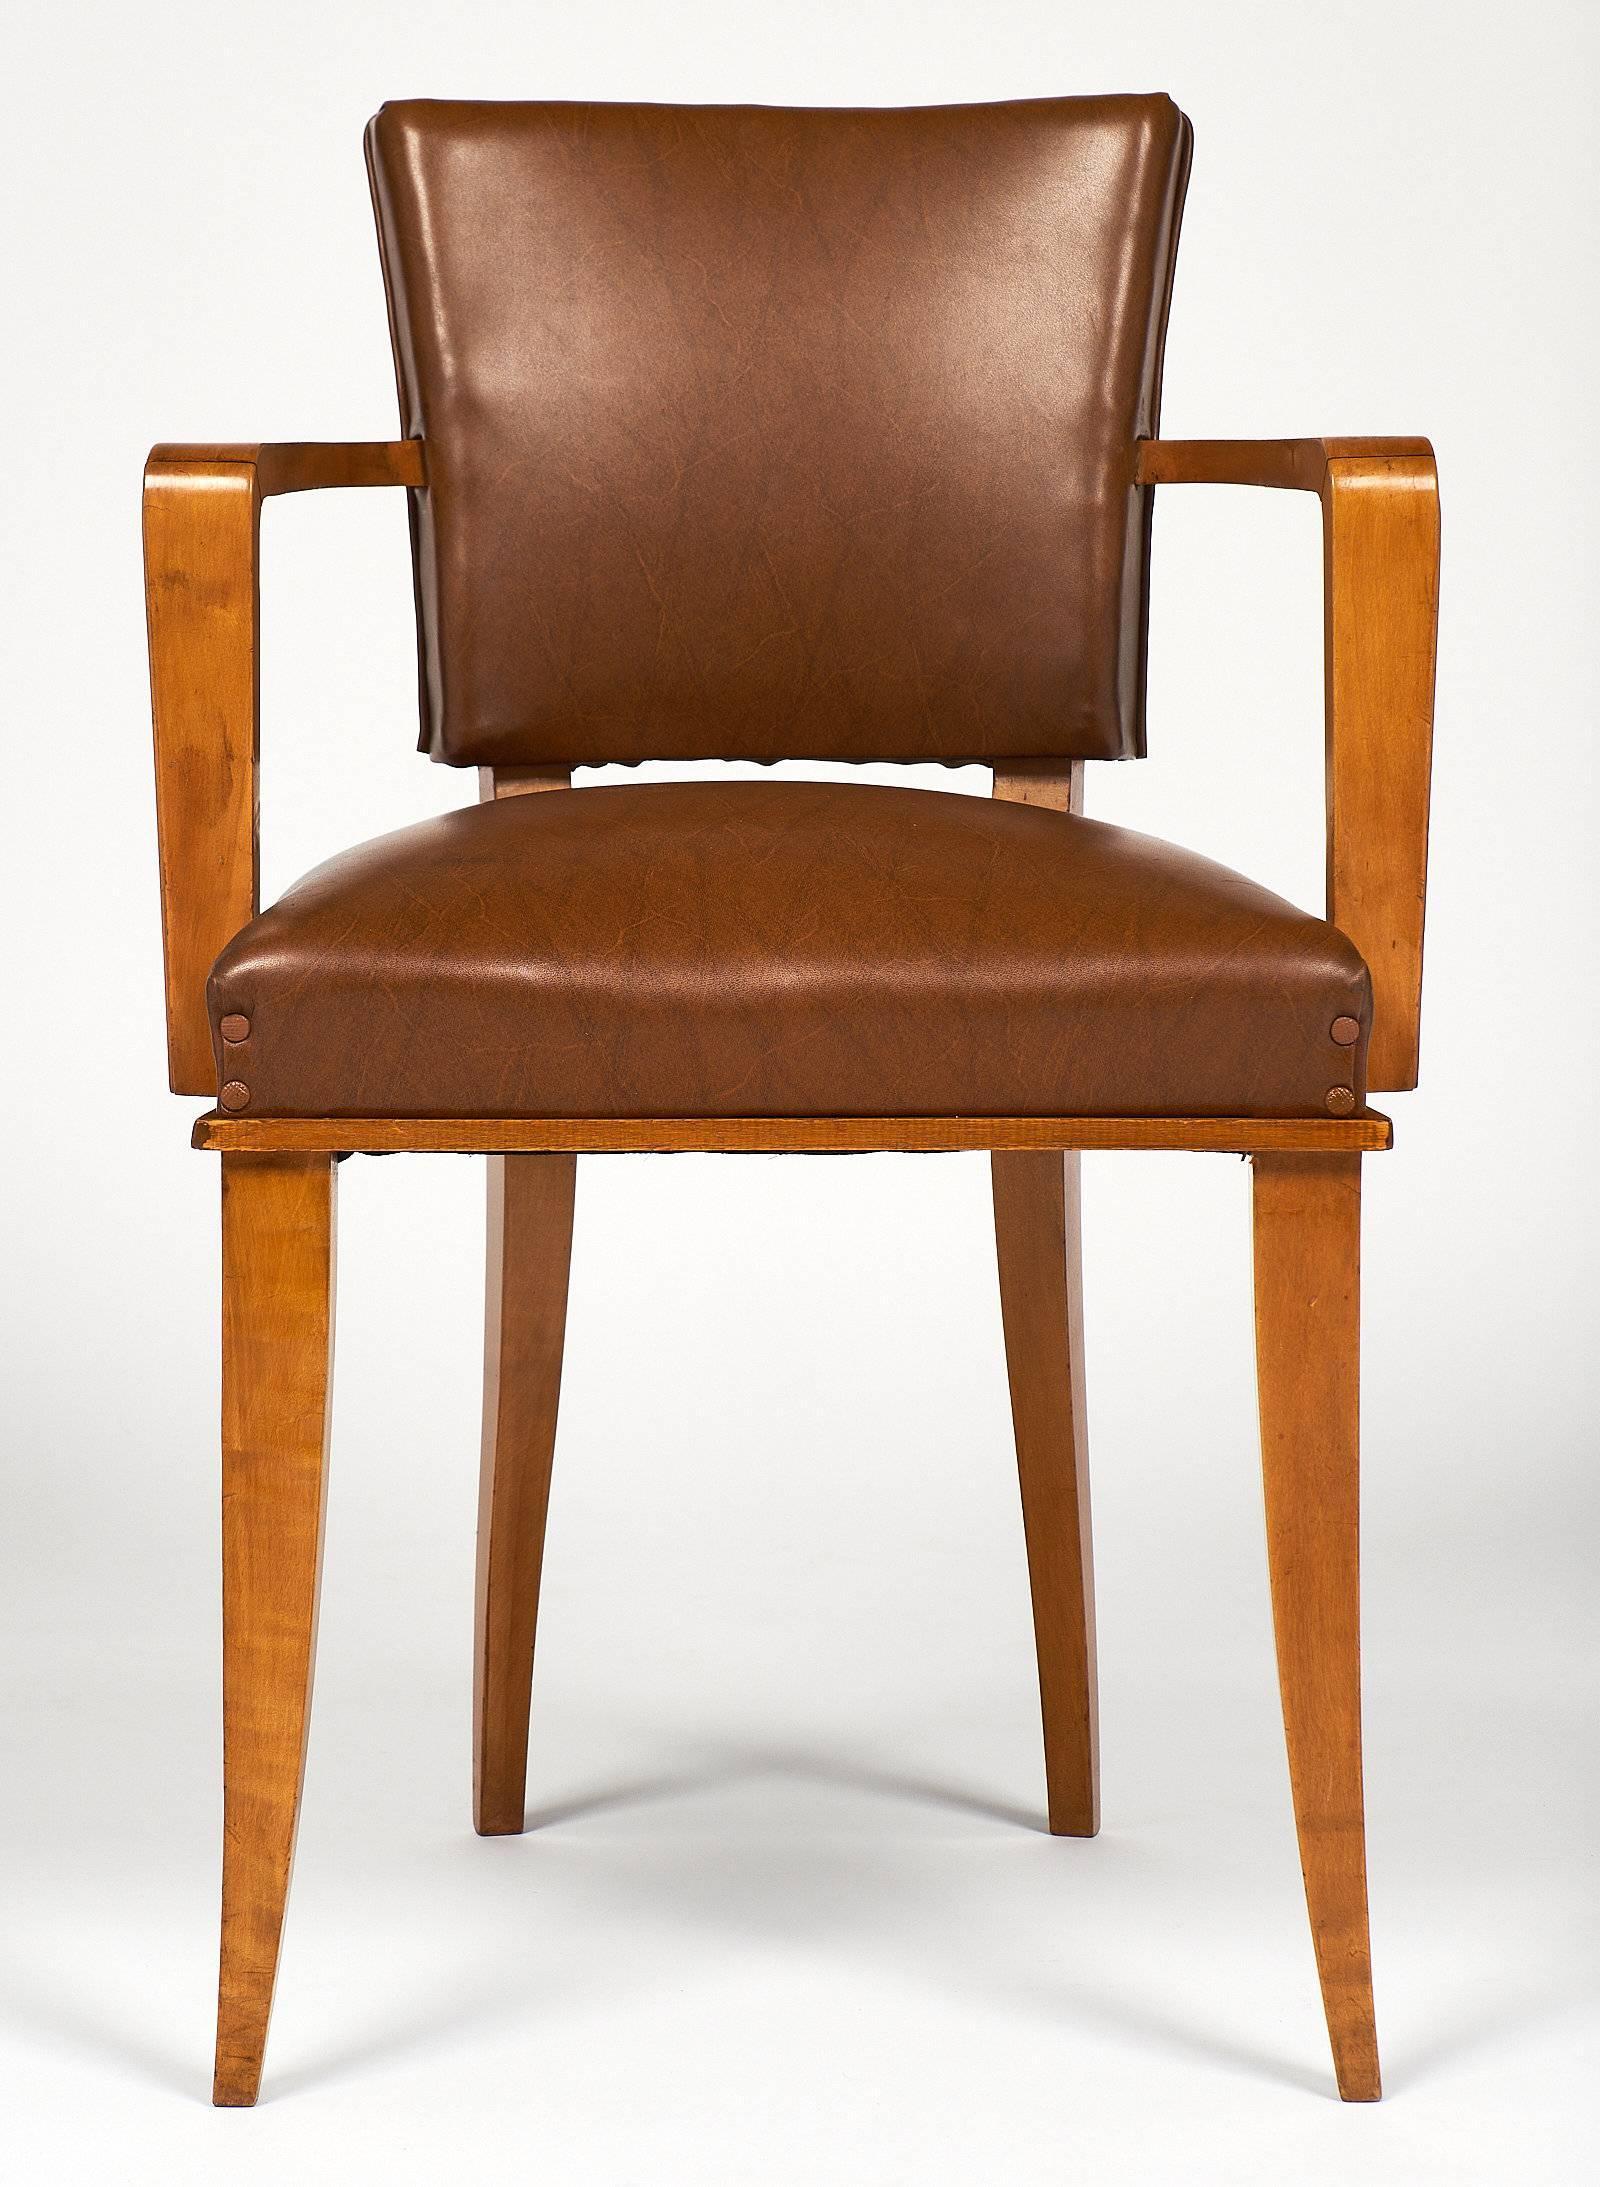 French Art Deco Bridge Chairs At 1stdibs